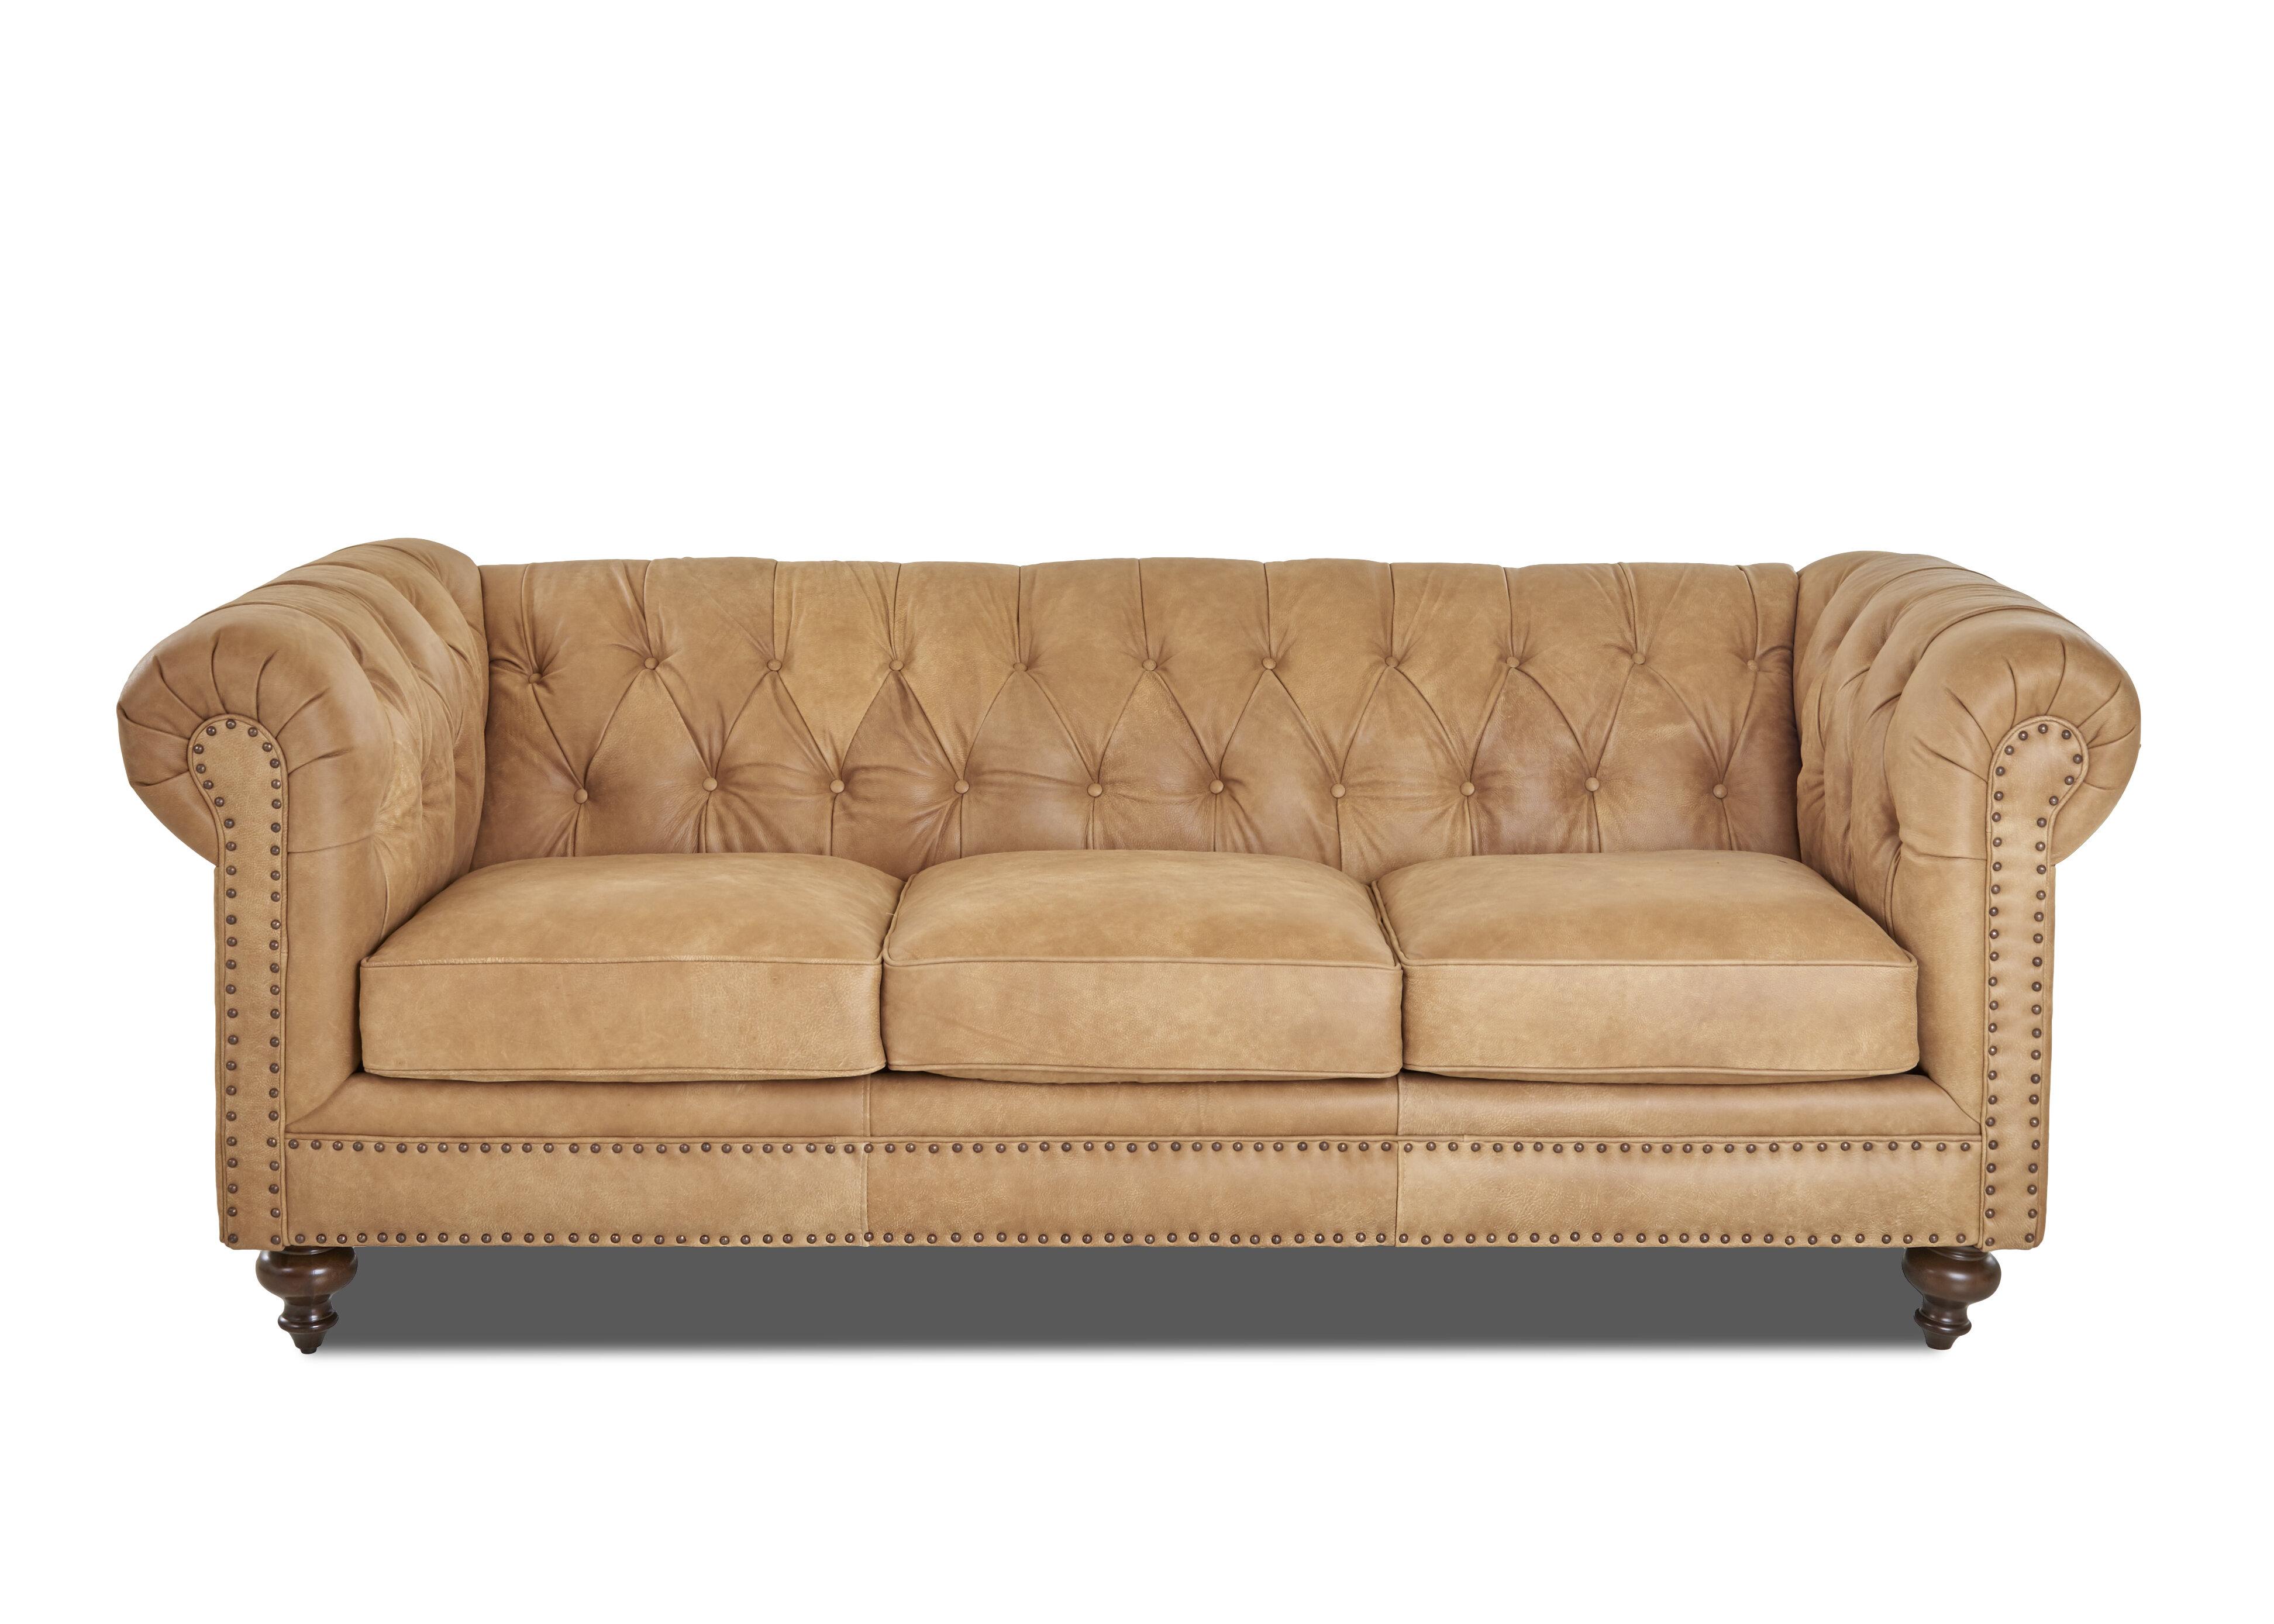 Kavya Leather Chesterfield Sofa